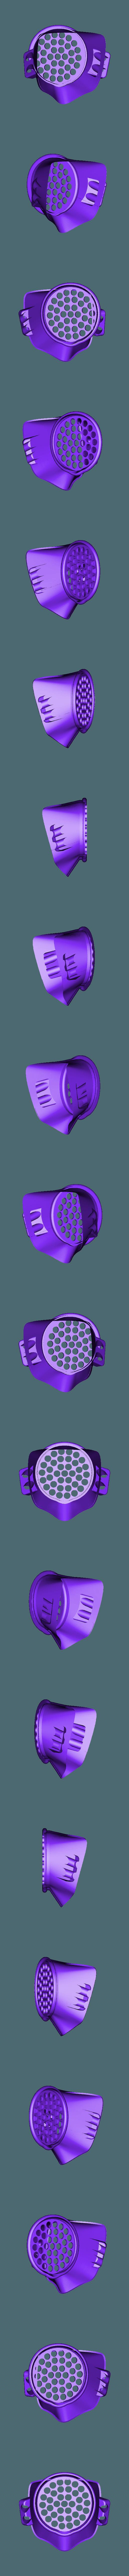 size1.stl Download free STL file COVİD 19 MASK ! • 3D printing design, pypltrkndlk